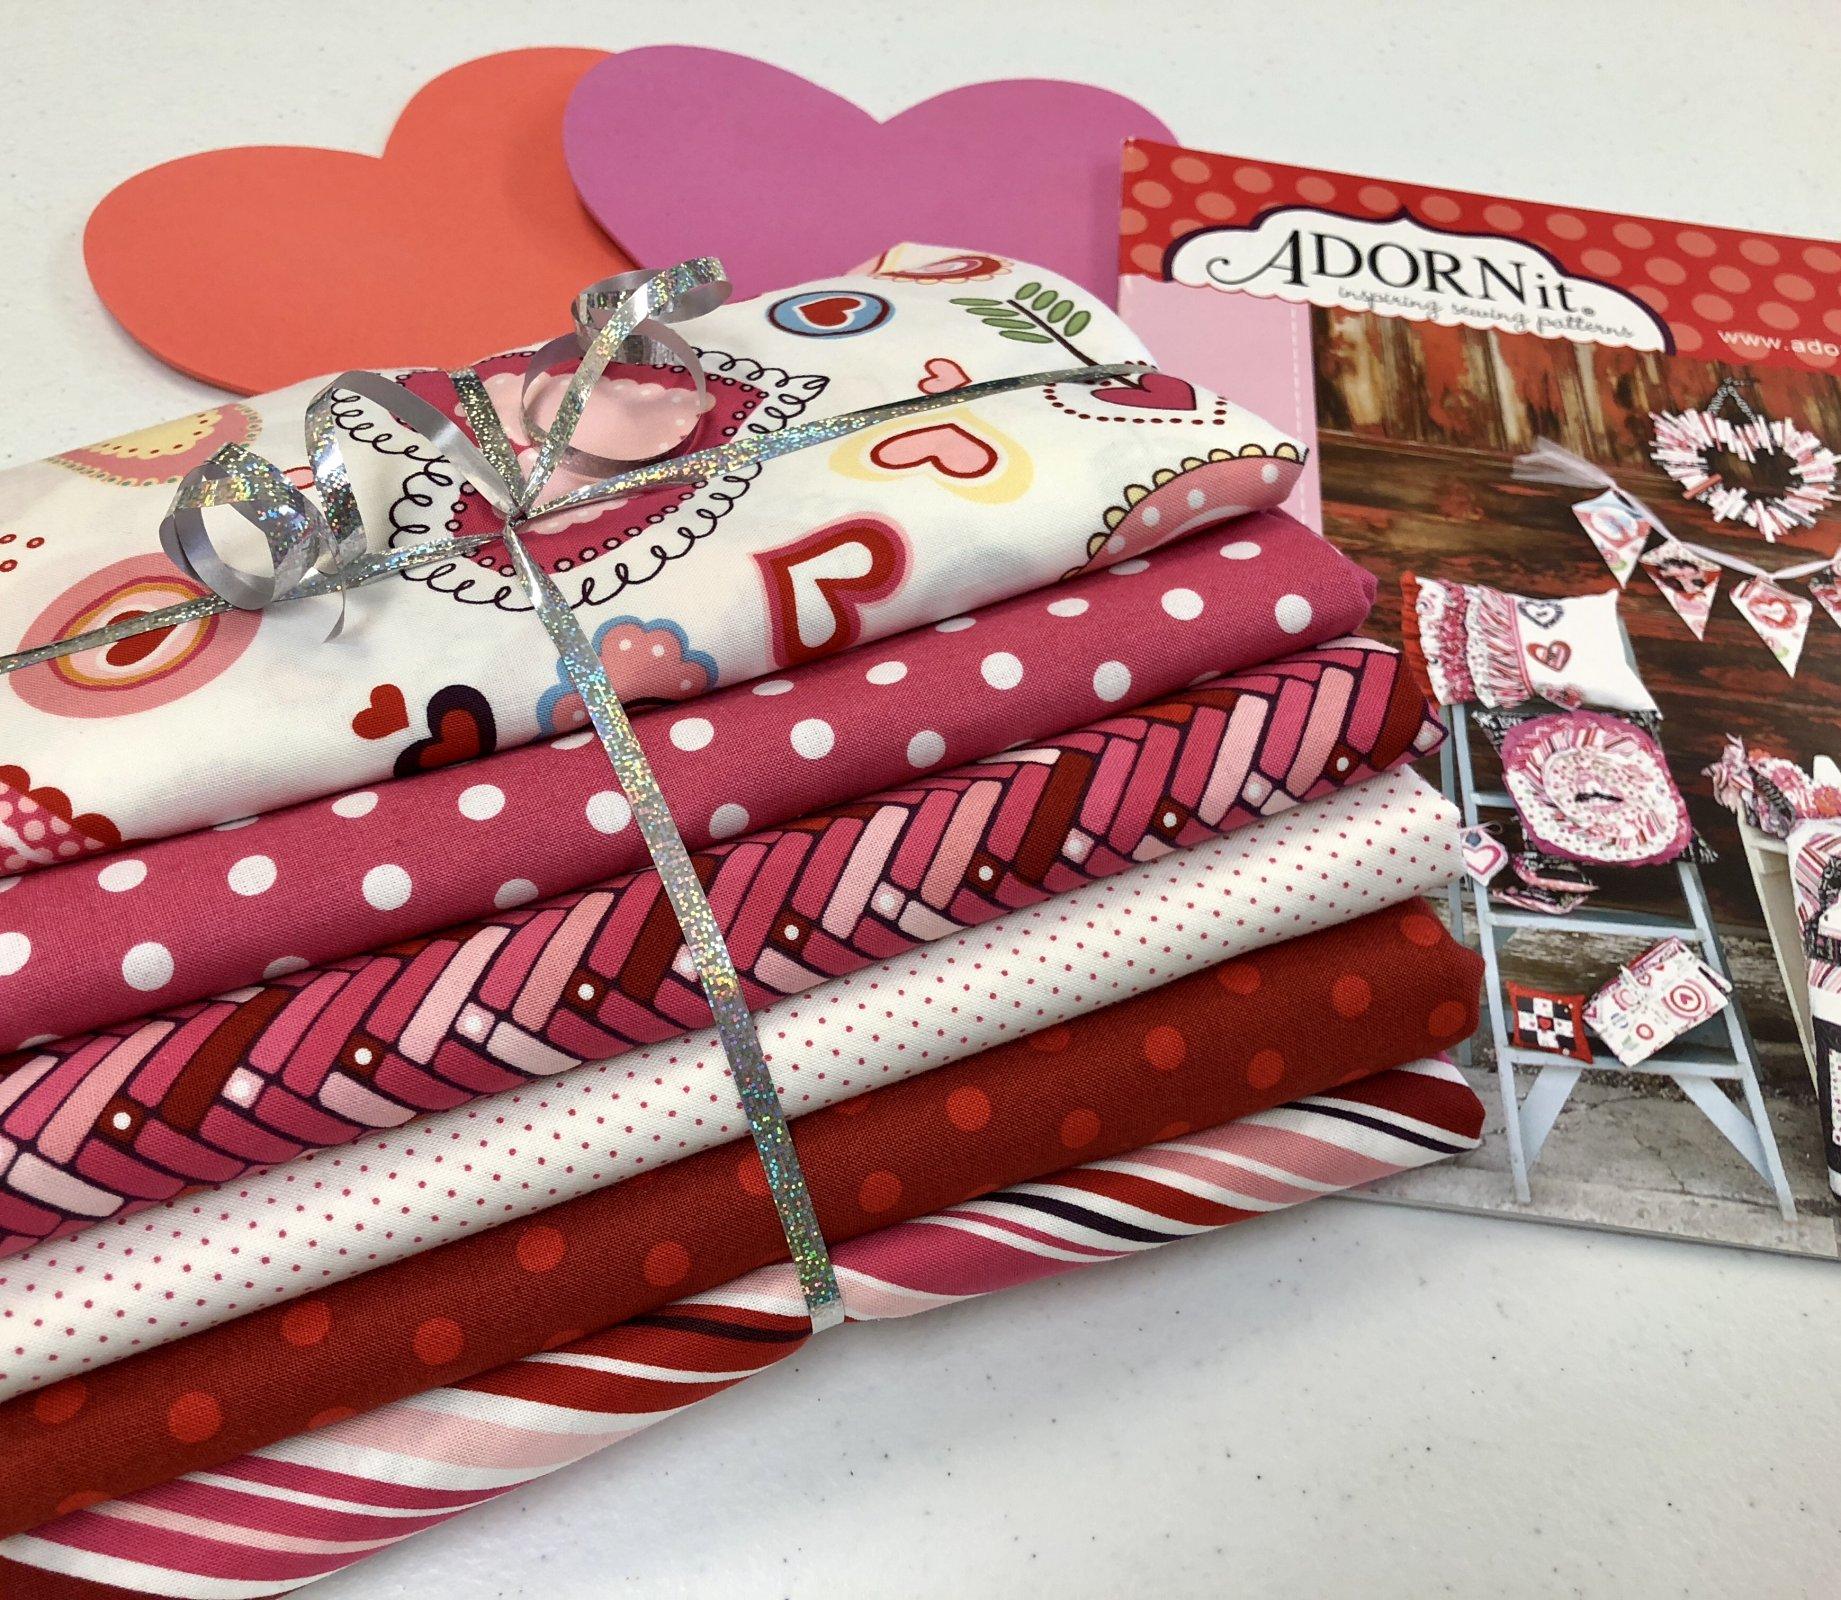 ADORNit Valentine Kit